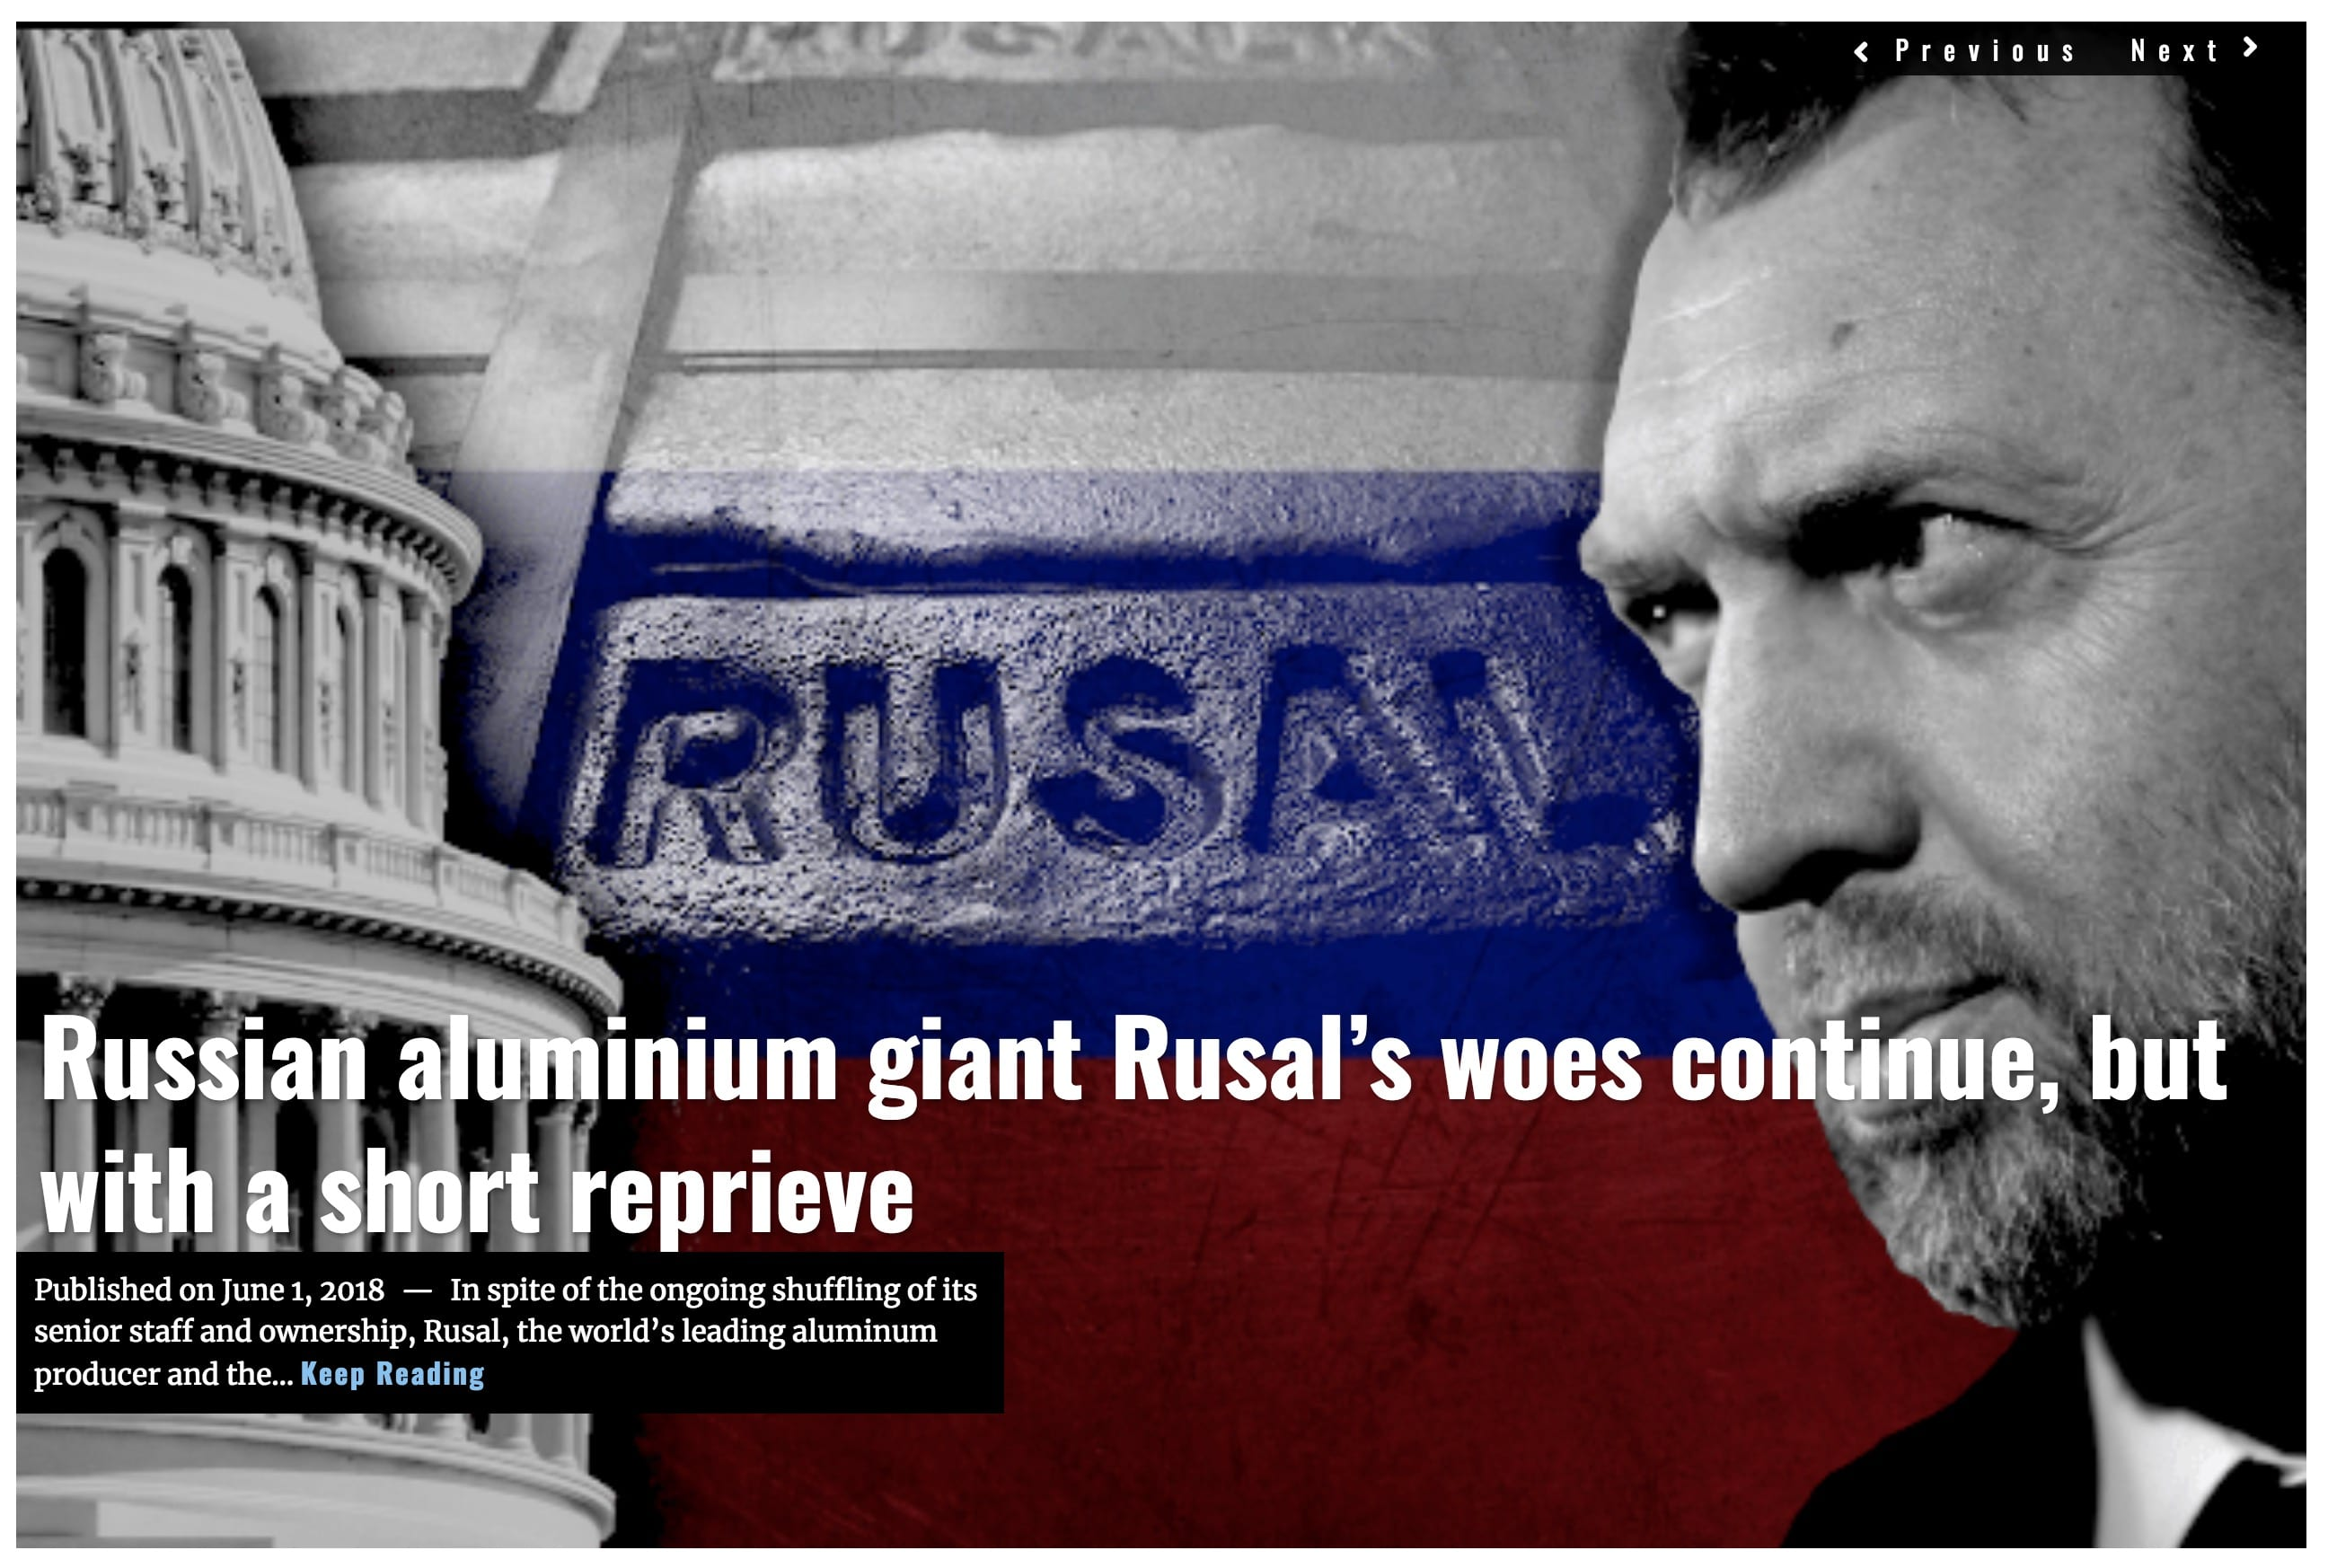 Image Lima Charlie News Headline Rusal's woes JUNE 1 2018